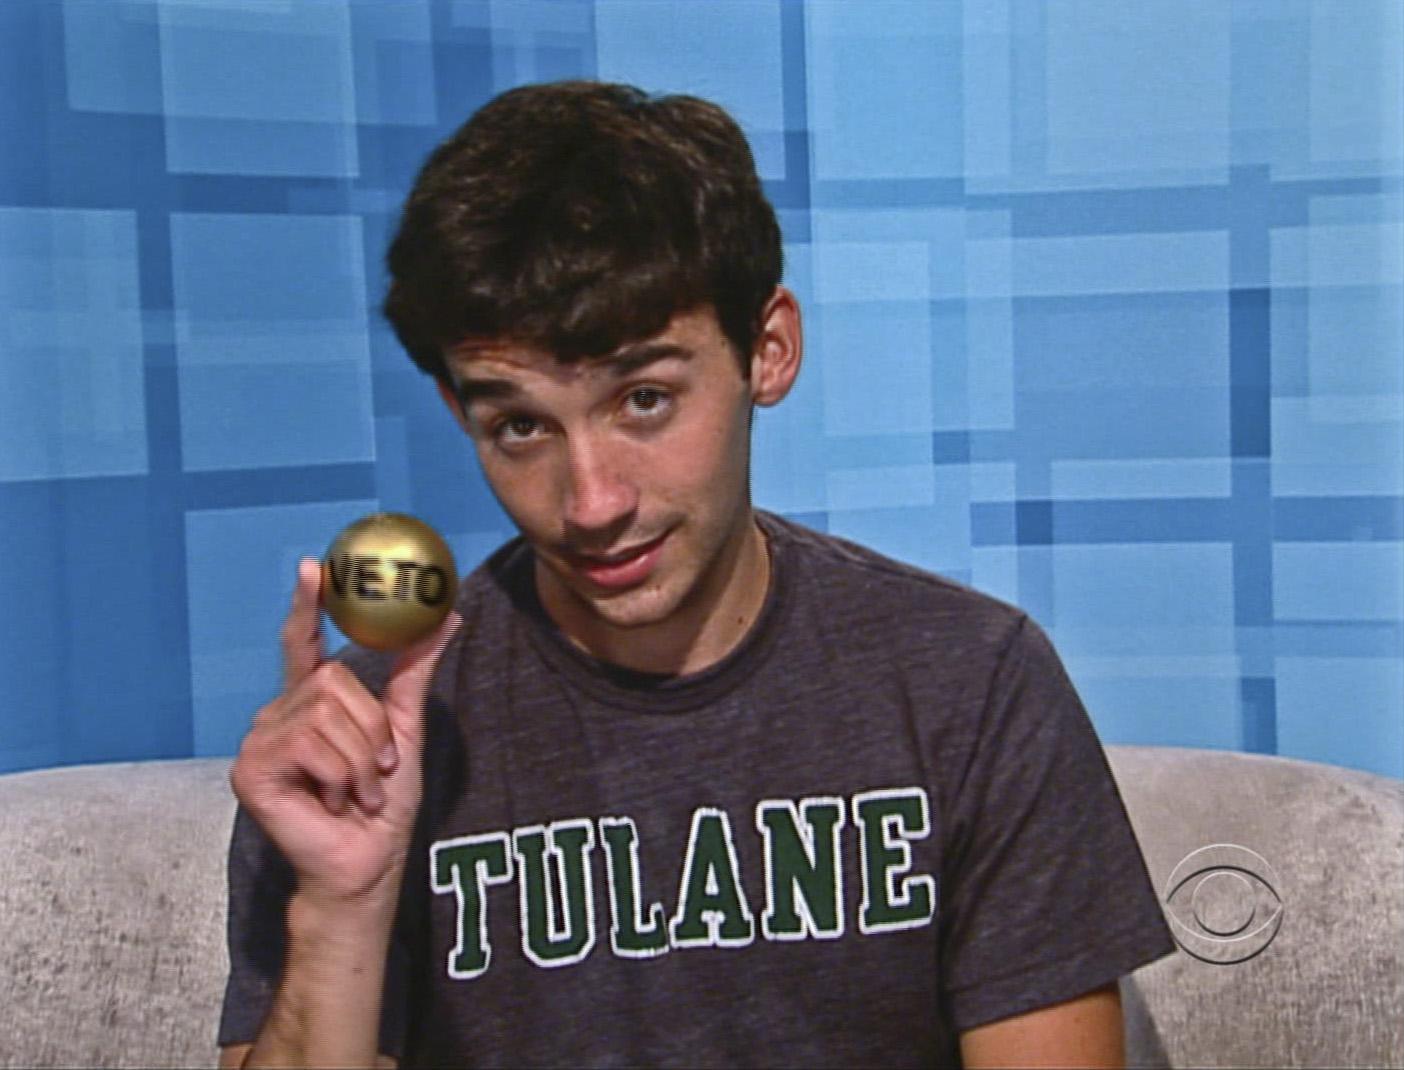 Ian Wins the Veto Ball